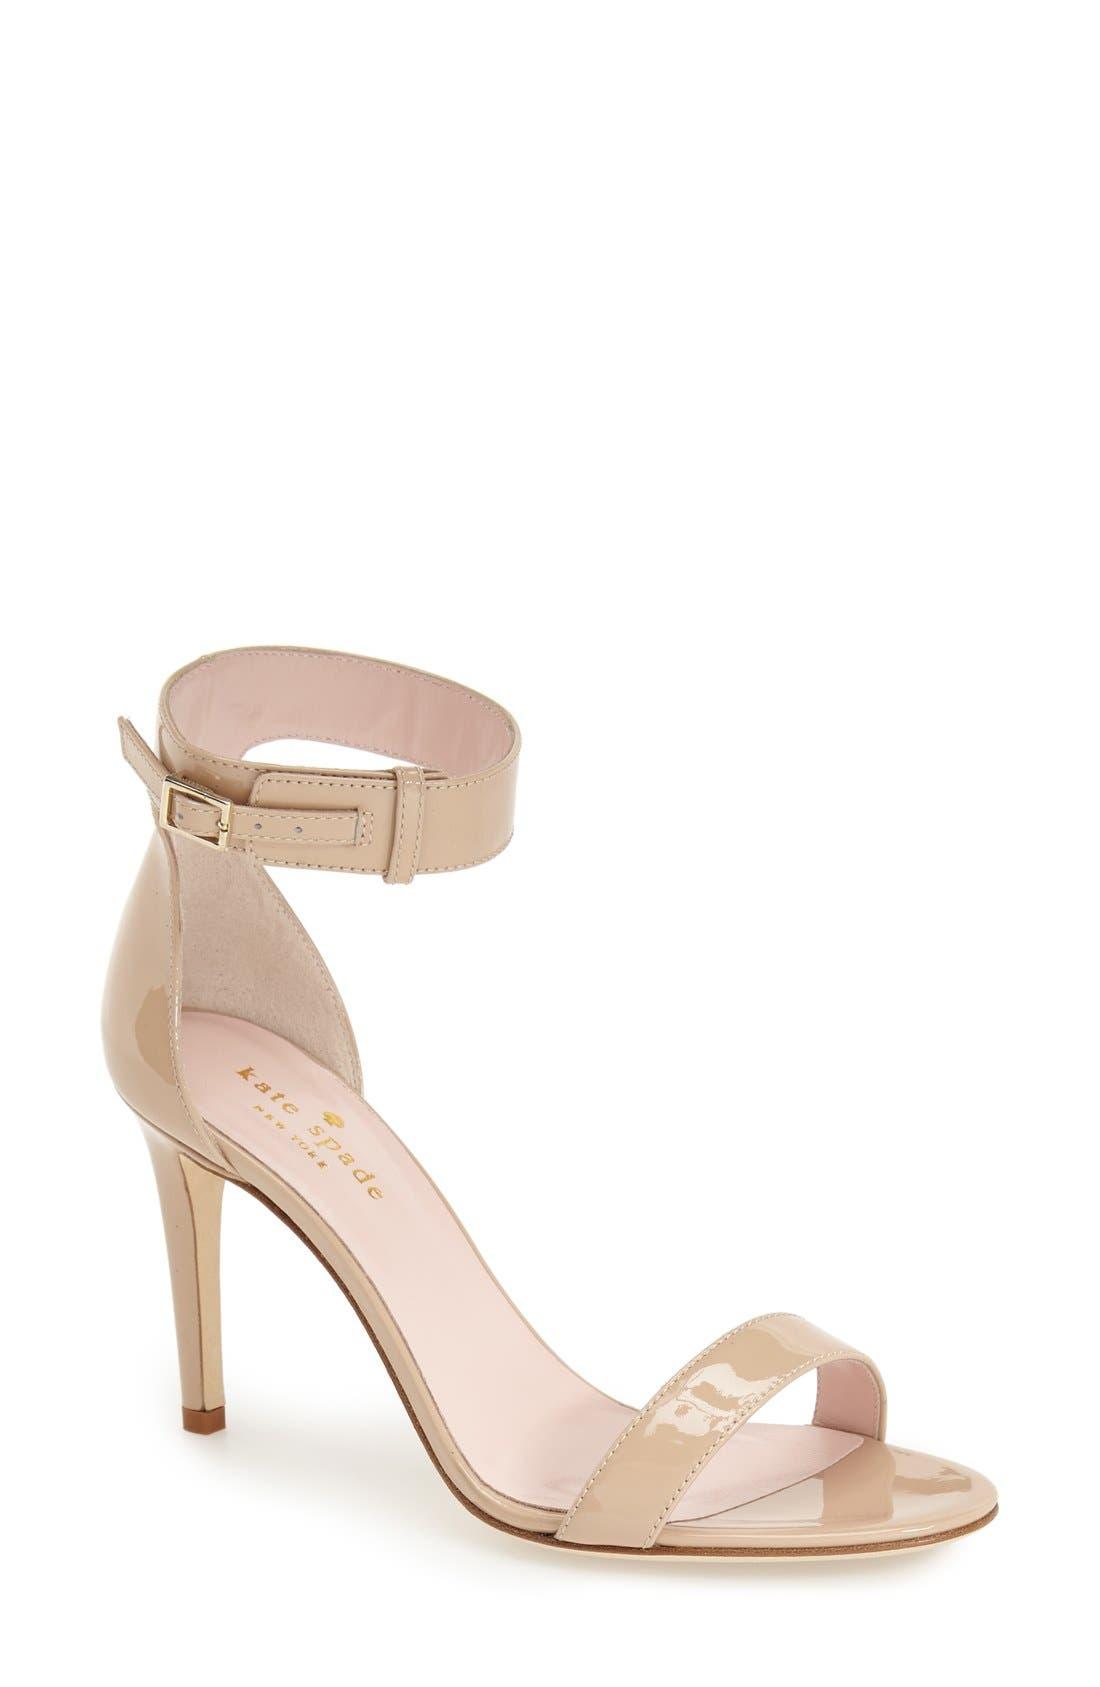 Alternate Image 1 Selected - kate spade new york 'isa' ankle strap sandal (Women)